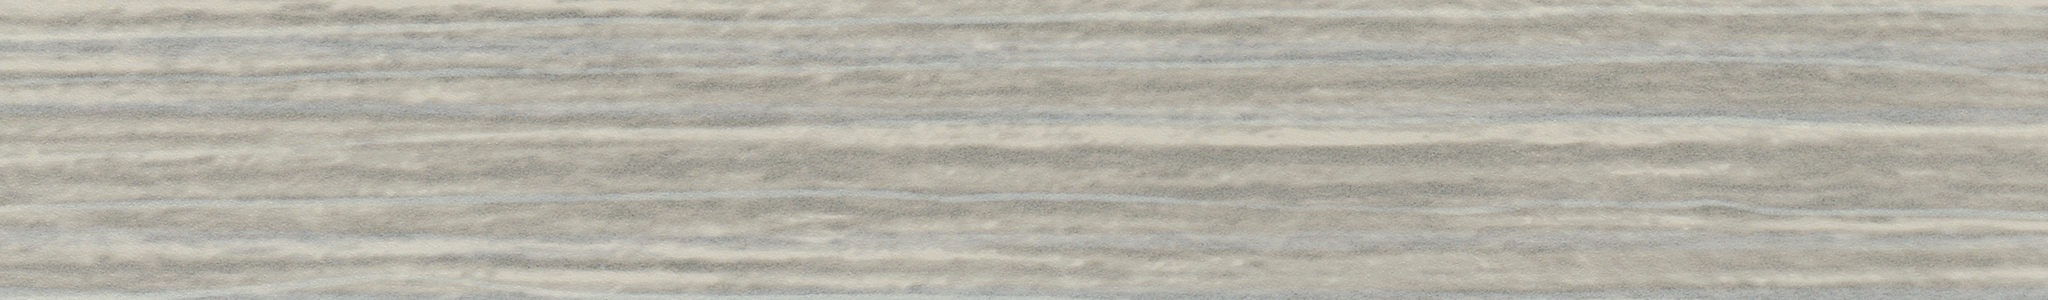 HD 29100 ABS hrana banian blanchi perla